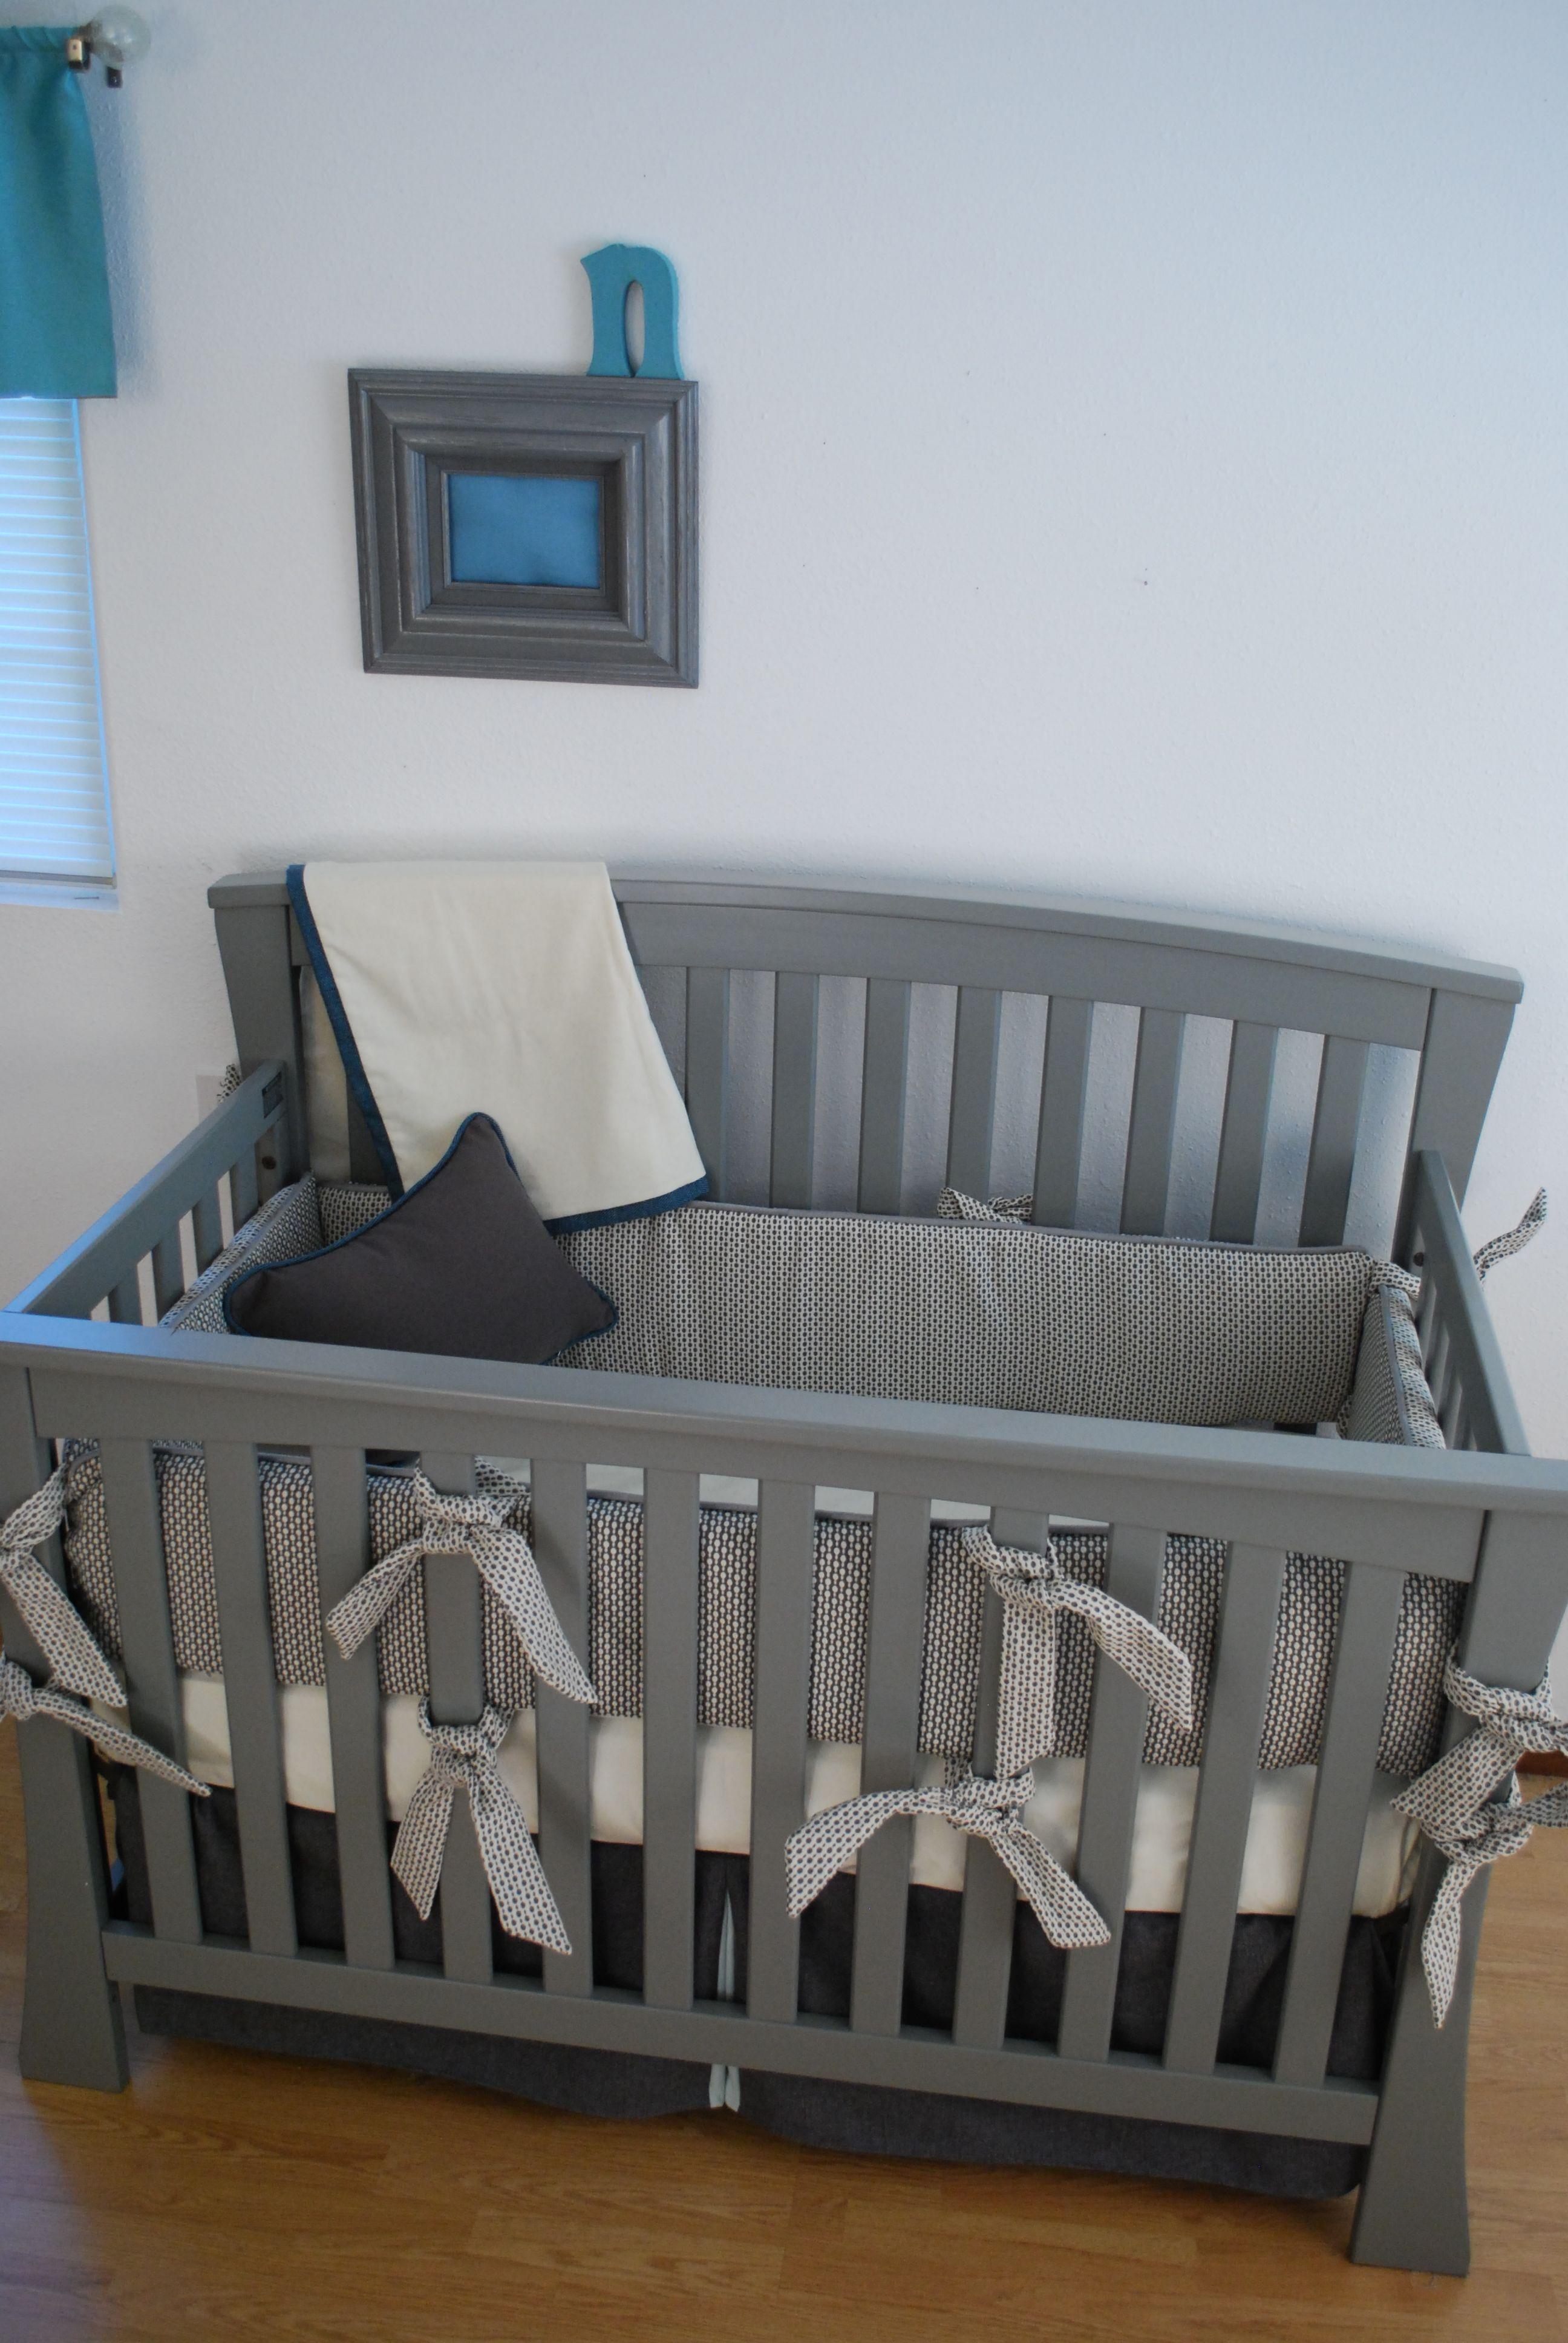 Pin By Lebanddj Jackson On Aqua Blue In The Nursery Grey Baby